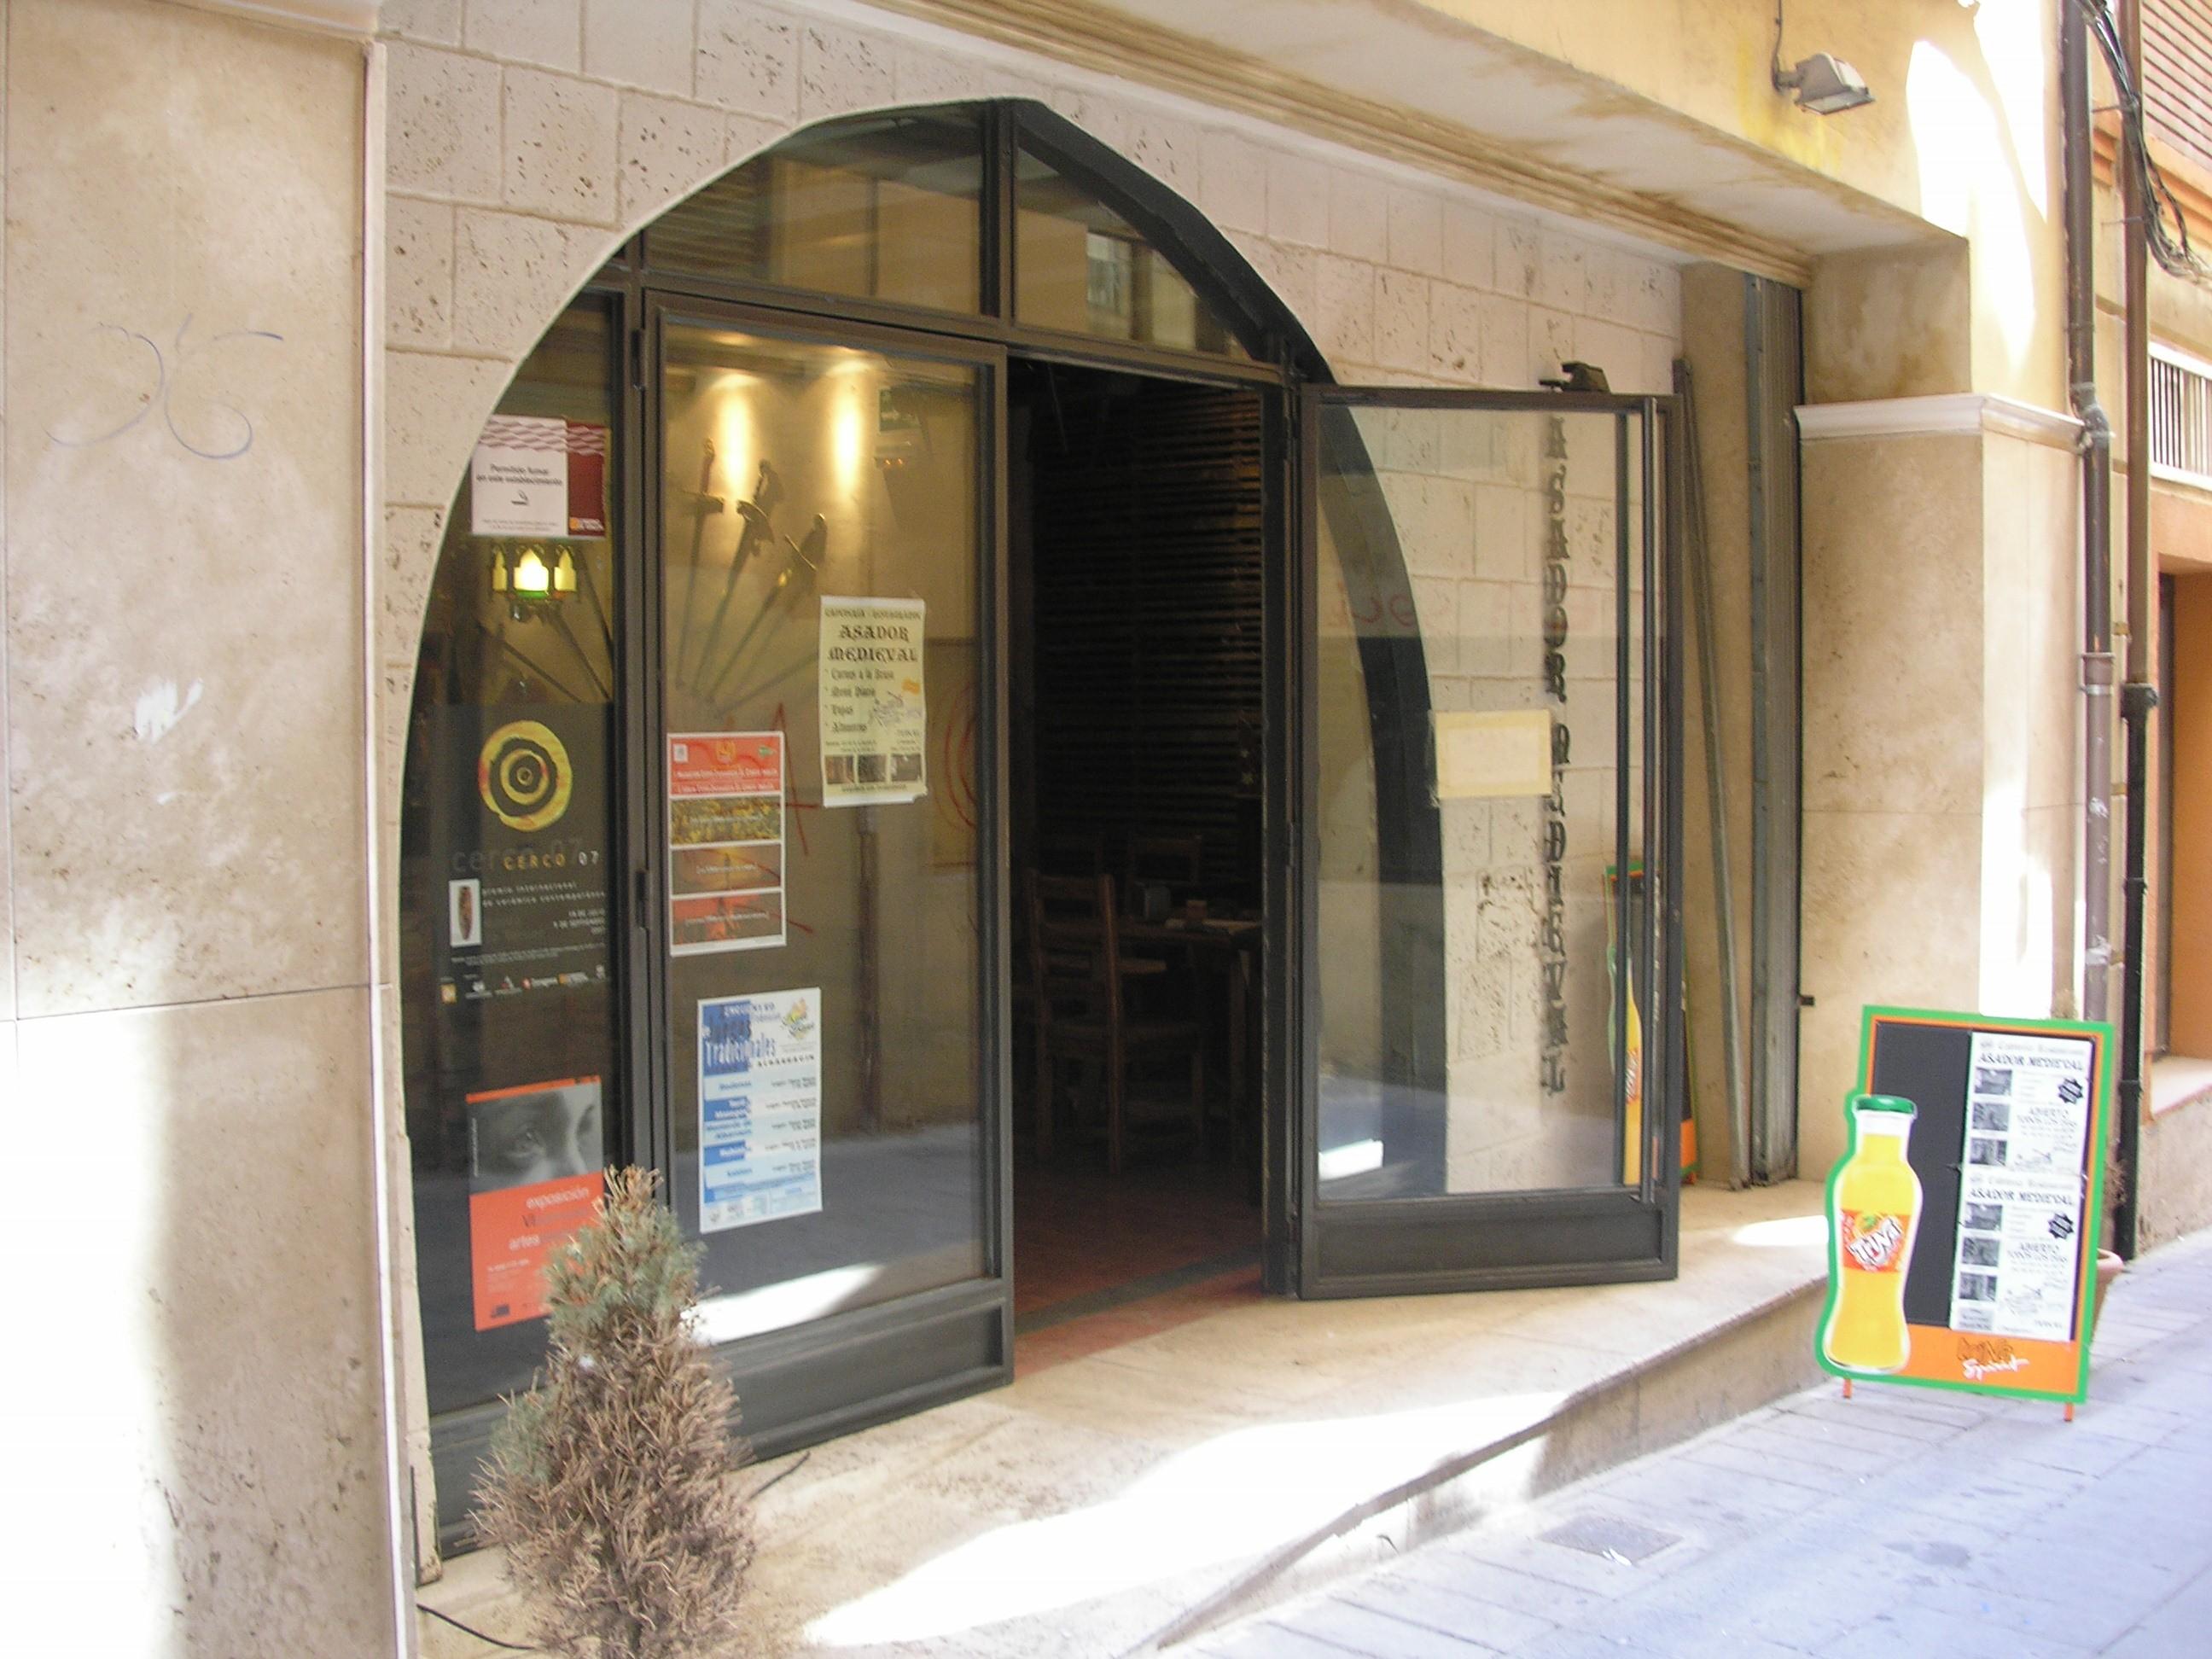 ASADOR MEDIEVAL - TERUEL Teruel Comunidad de Teruel